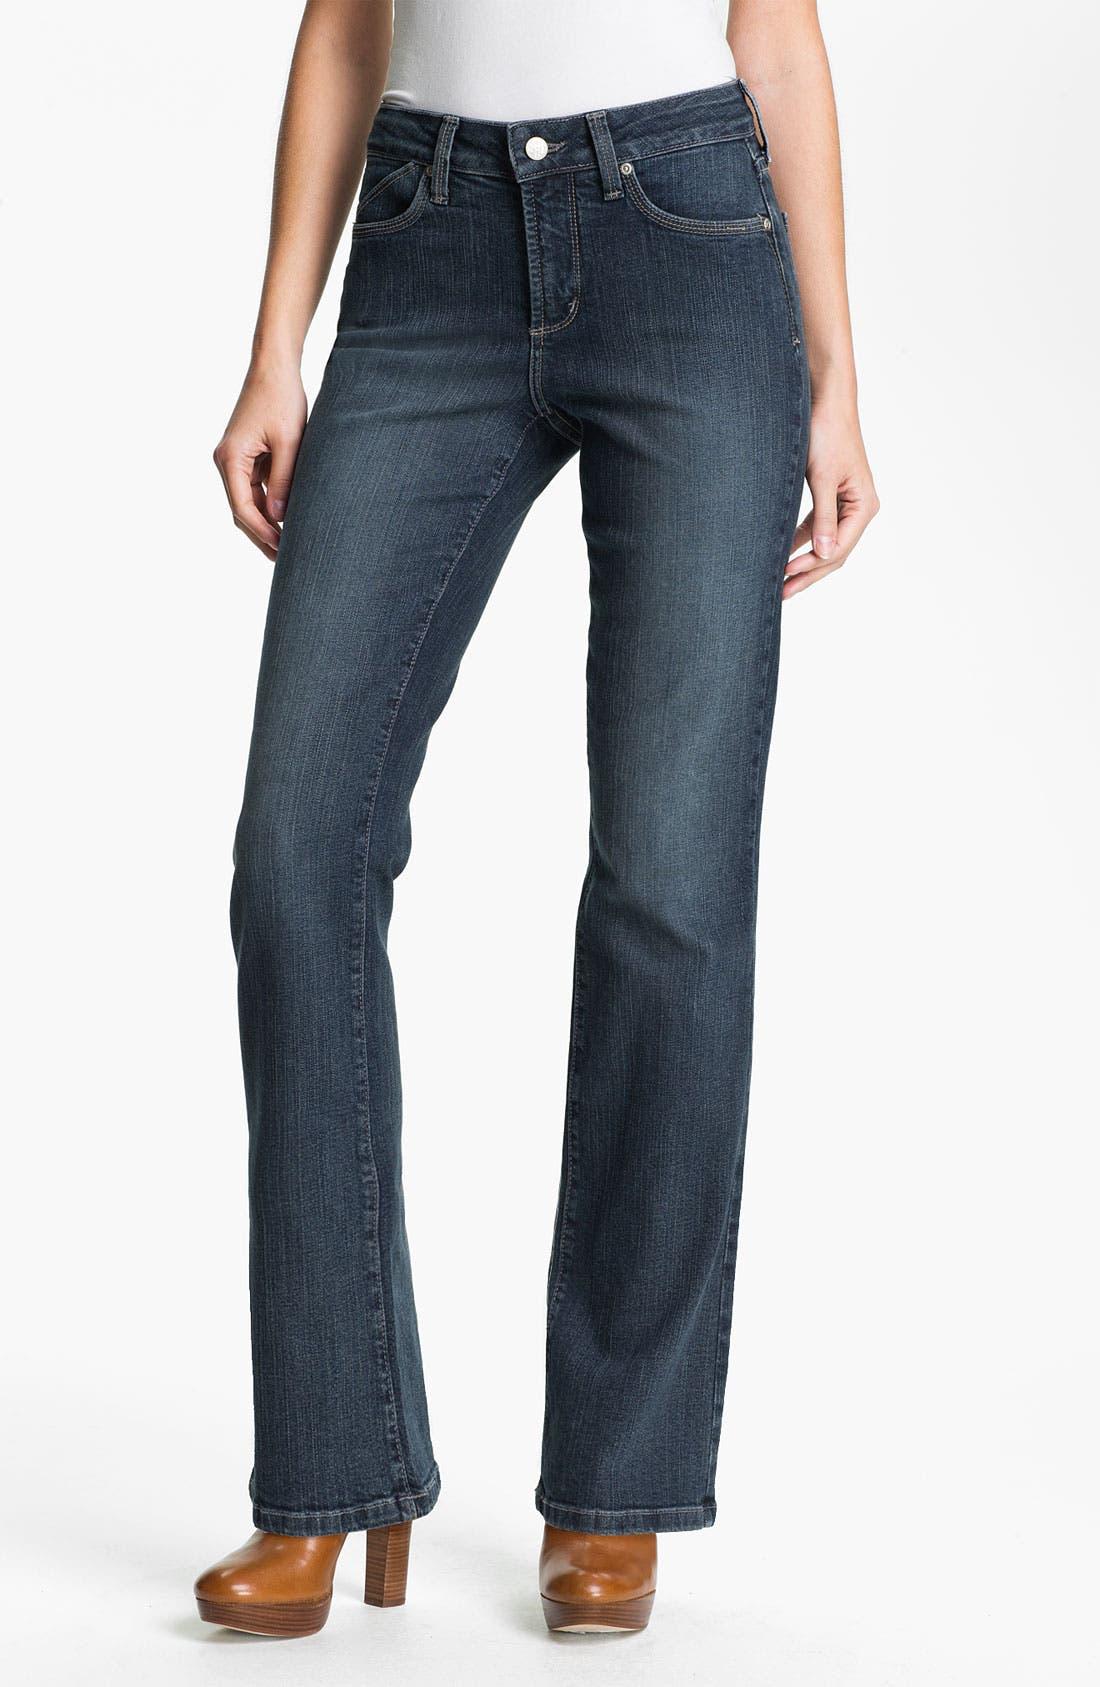 Alternate Image 1 Selected - NYDJ 'Barbara' Stitch Pocket Bootcut Jeans (Petite)